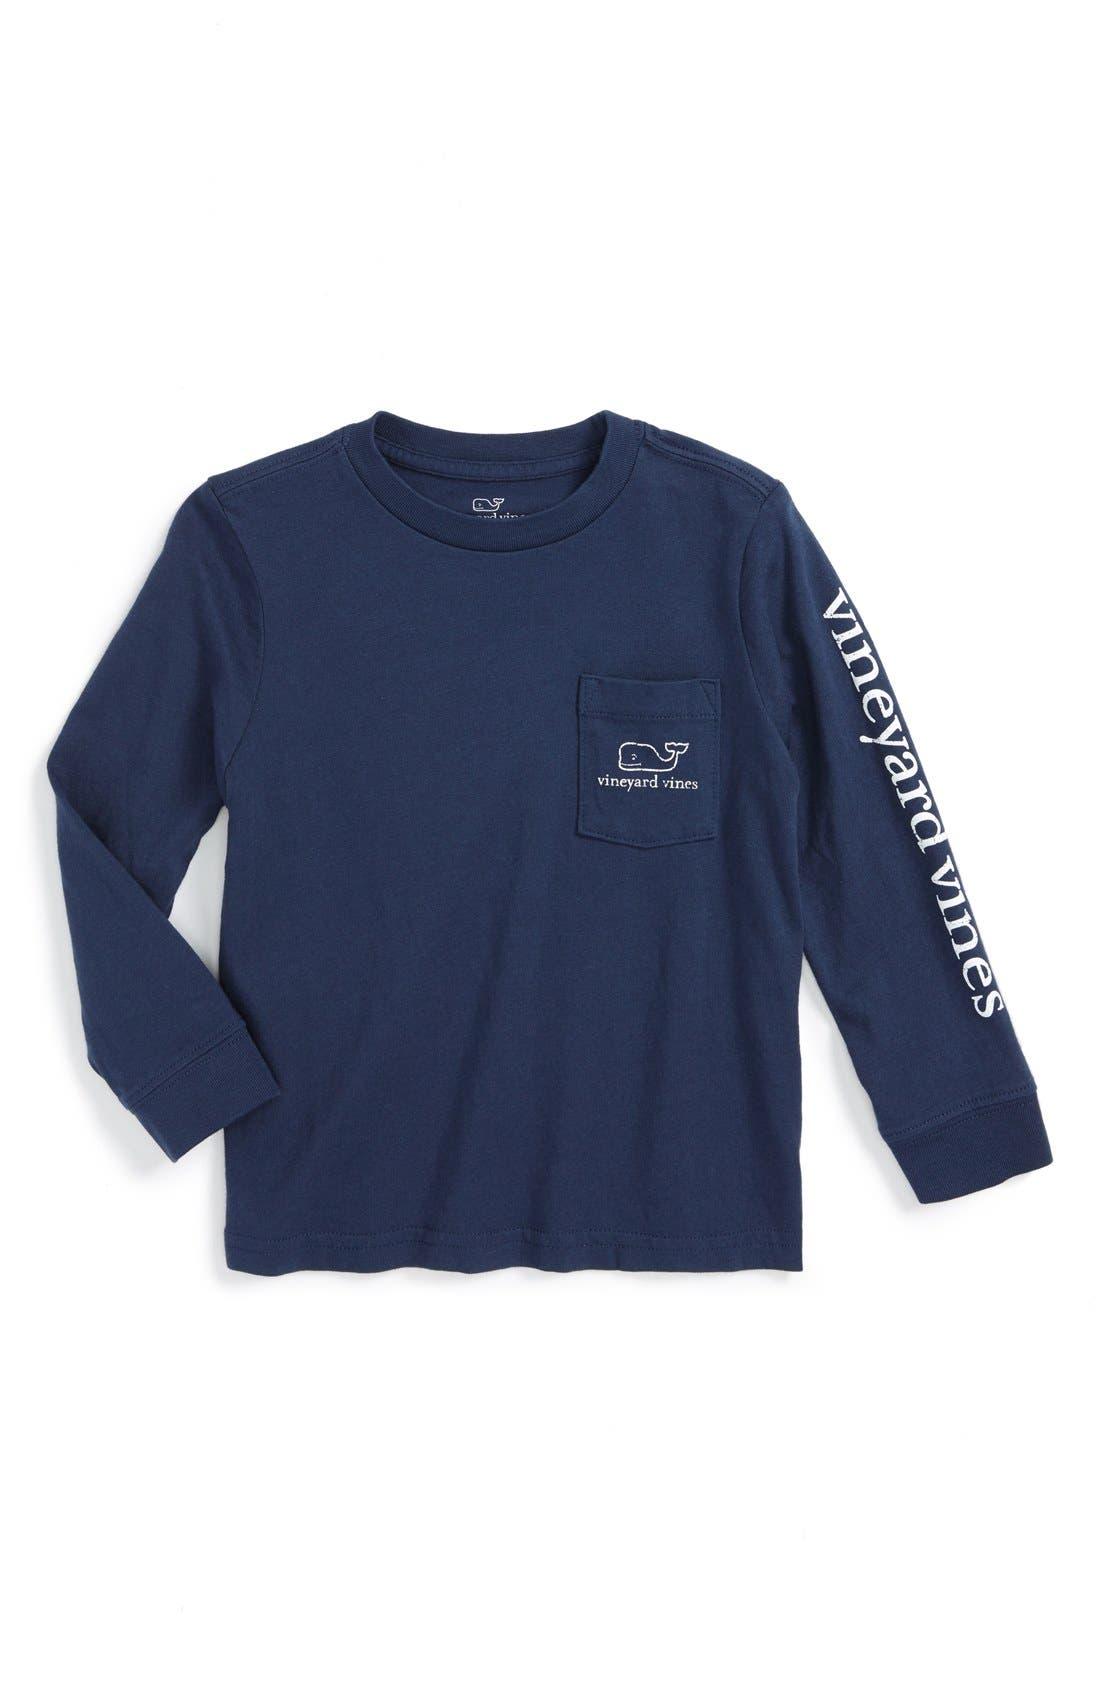 Alternate Image 1 Selected - vineyard vines Vintage Whale Graphic Long Sleeve T-Shirt (Toddler Boys & Little Boys)